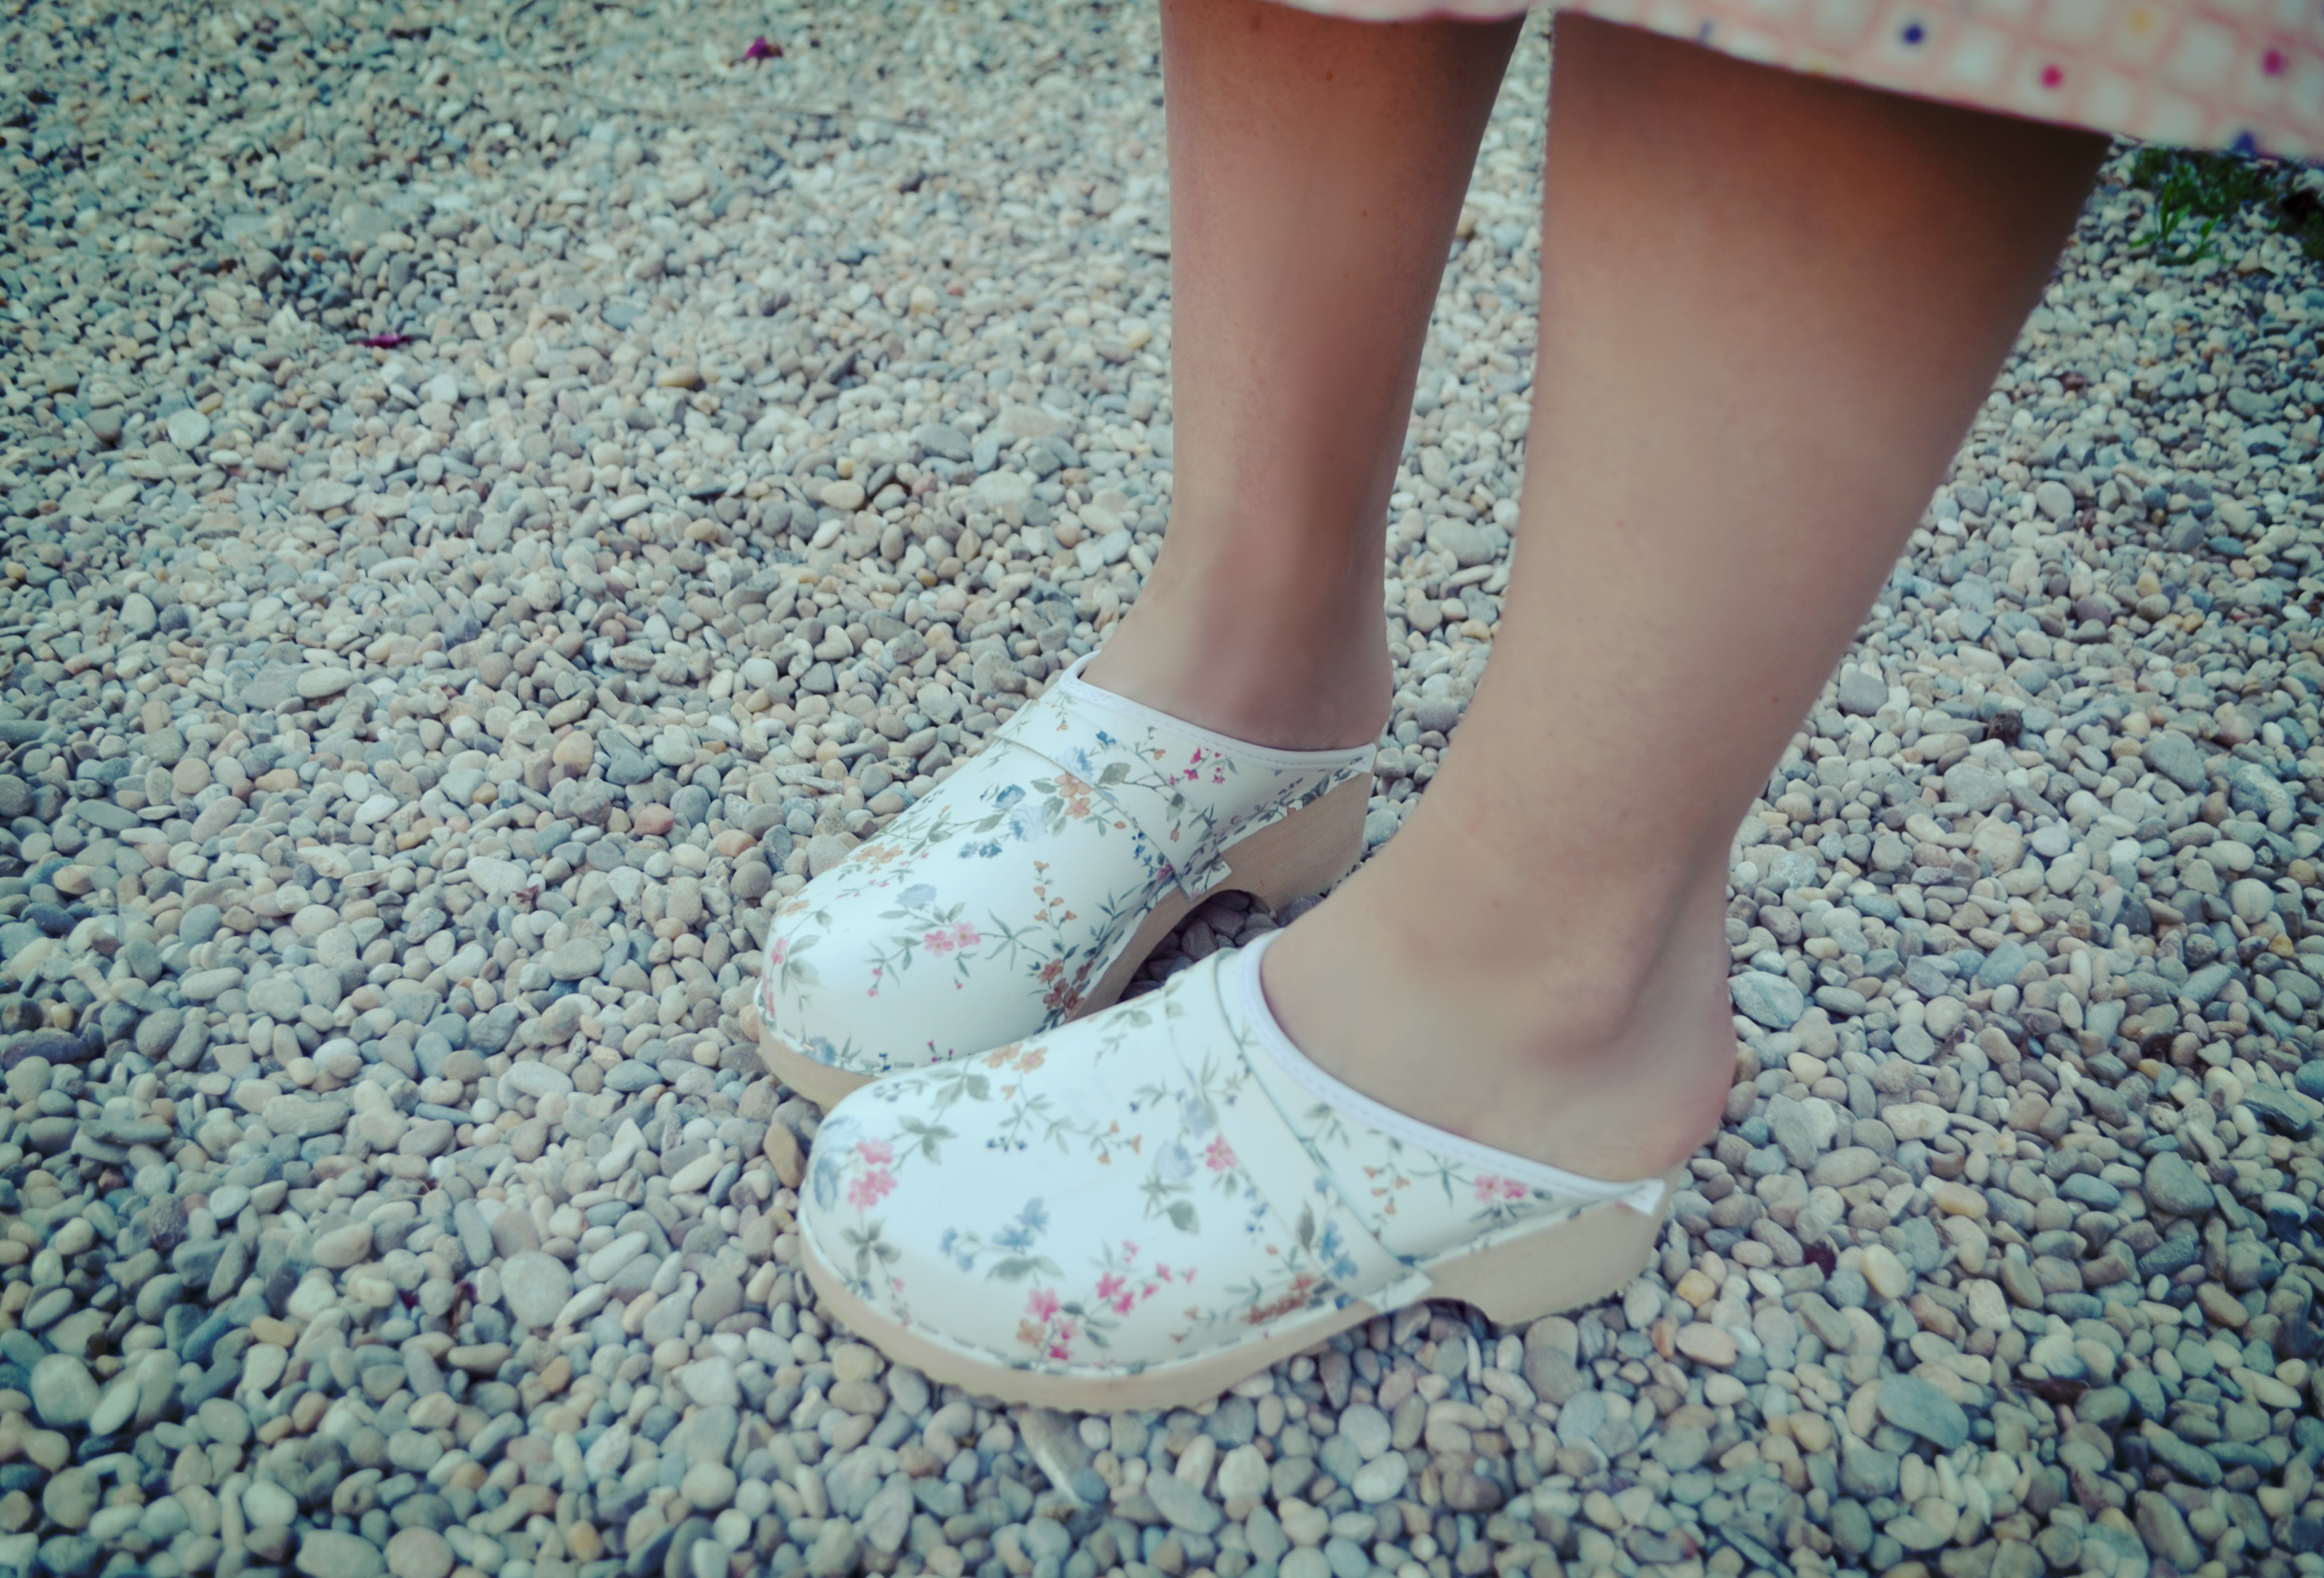 Suecos-de-flores-blog-de-moda-ChicAdicta-viaje-florette-influencers-flowers-shoes-Chic-Adicta-PiensaenChic-Piensa-en-Chic